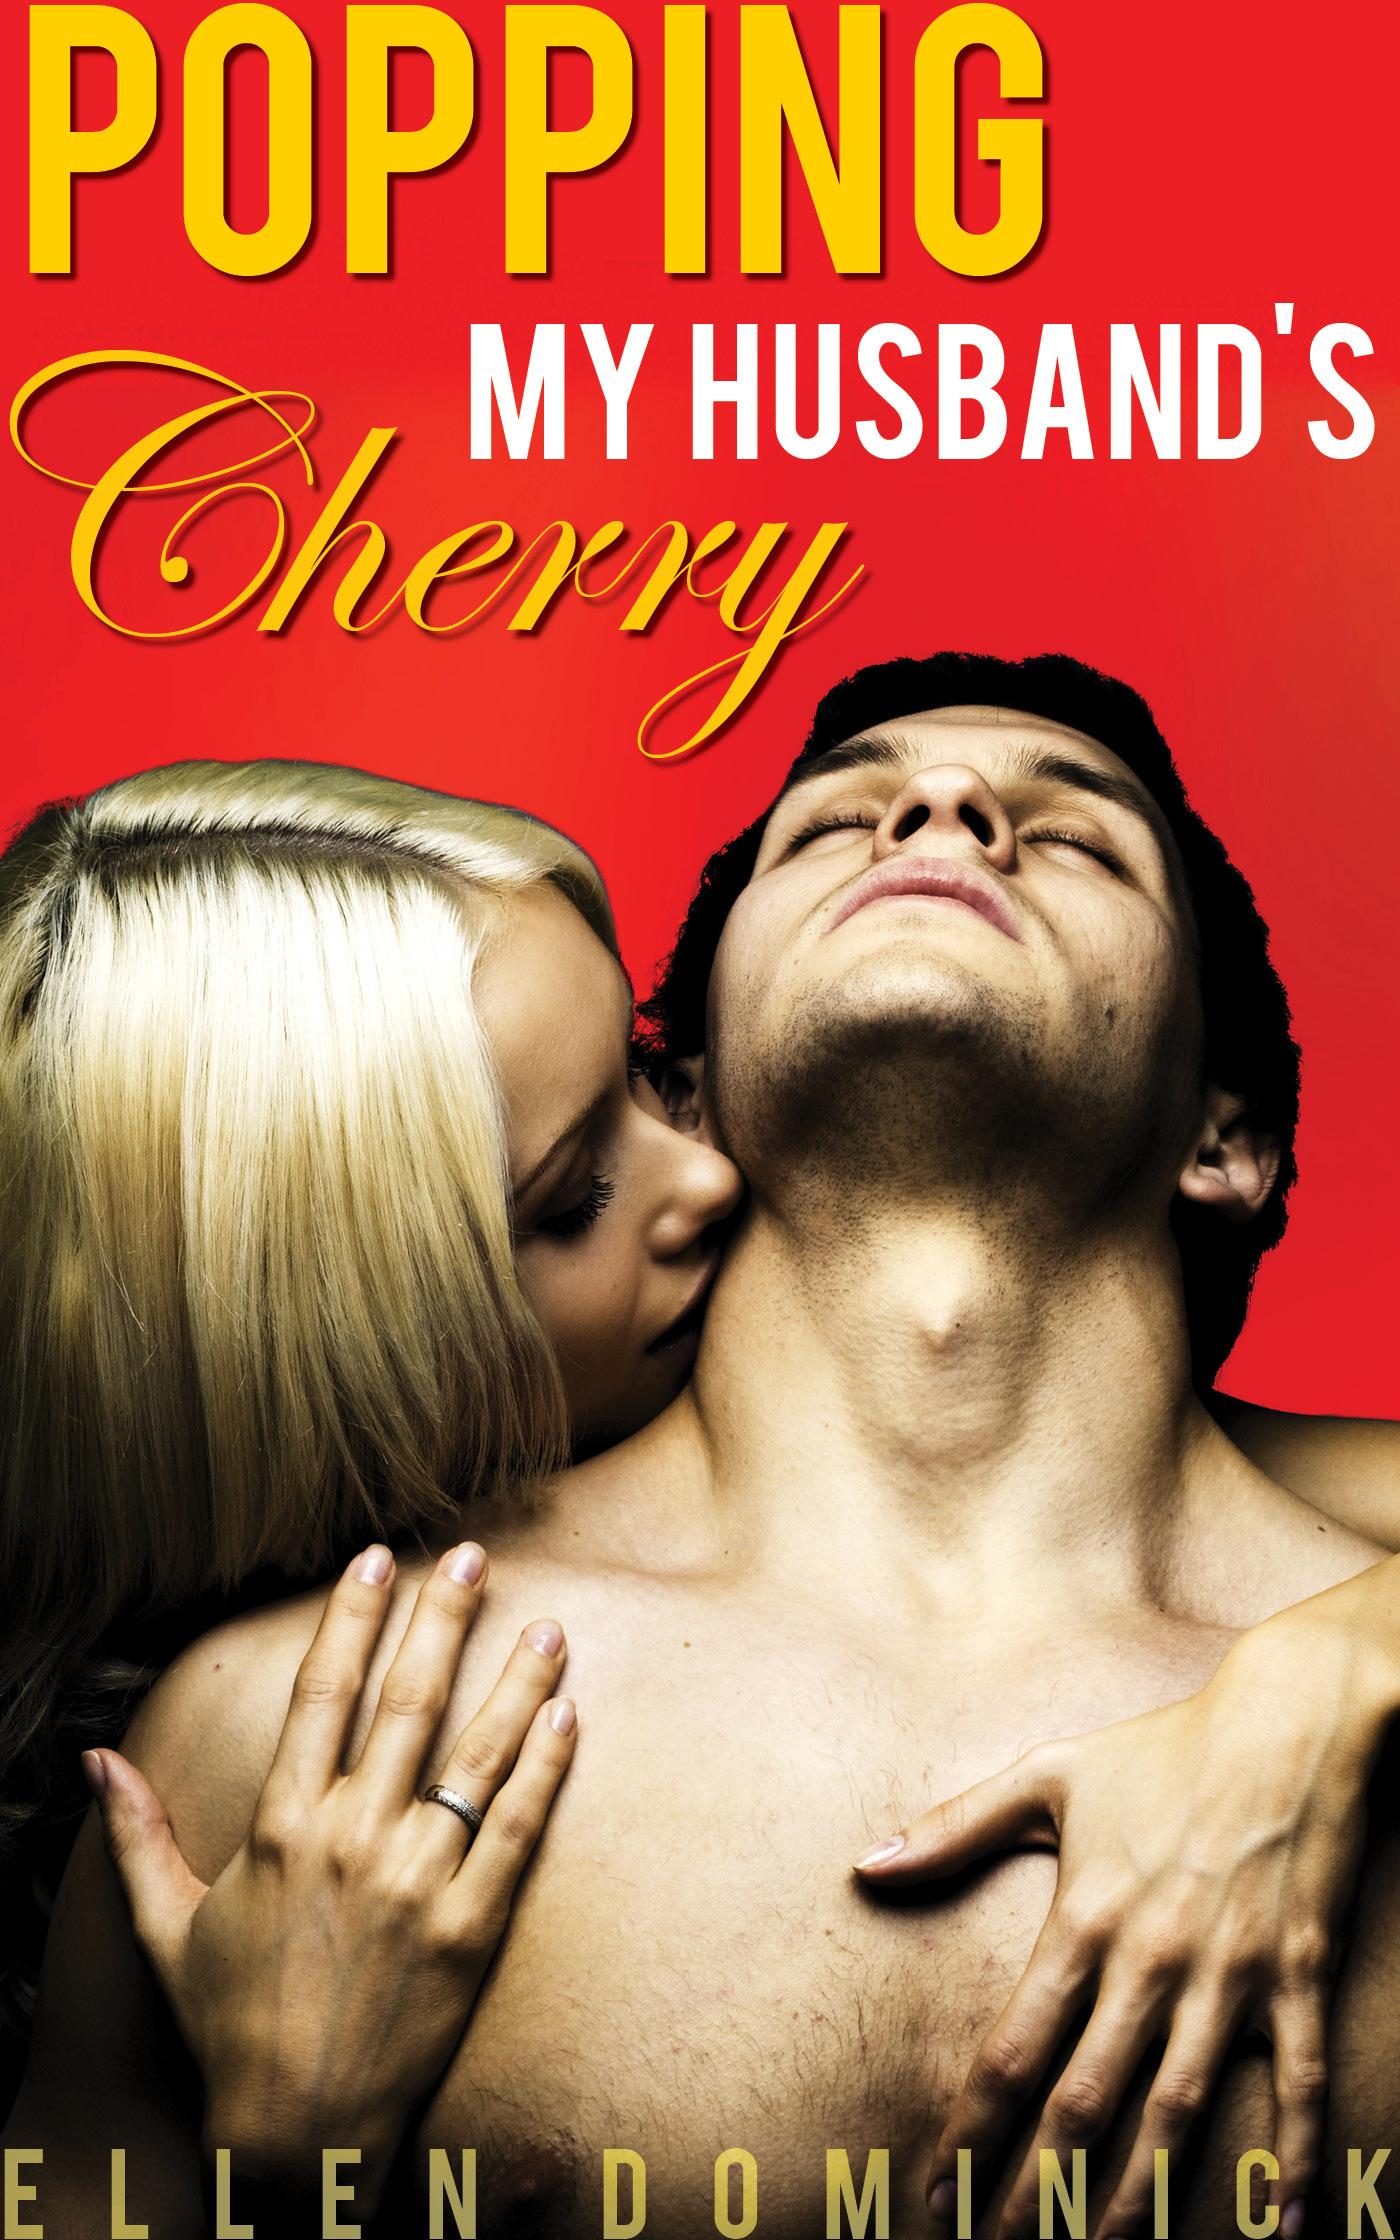 Popping my husband's cherry: a strap-on honeymoon